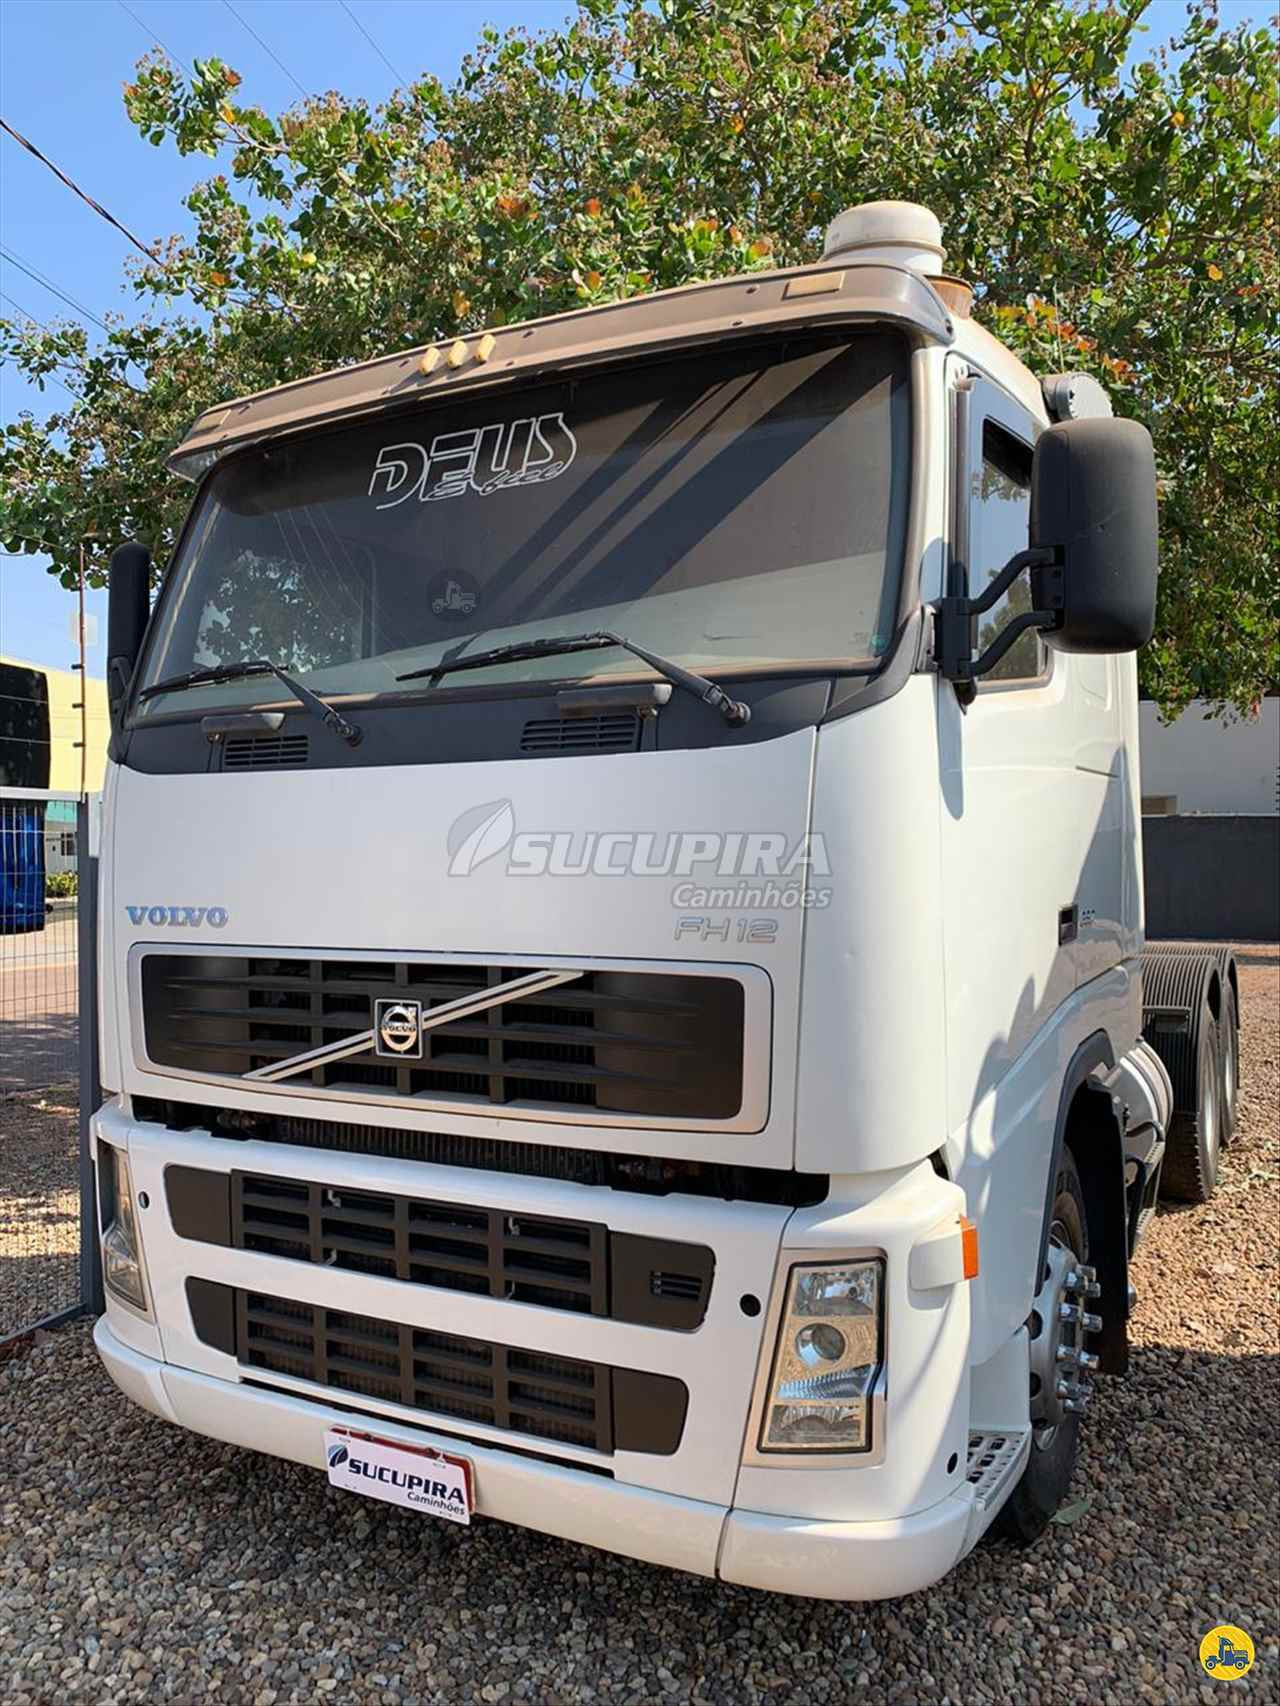 VOLVO FH12 380 de Sucupira Caminhões - RONDONOPOLIS/MT